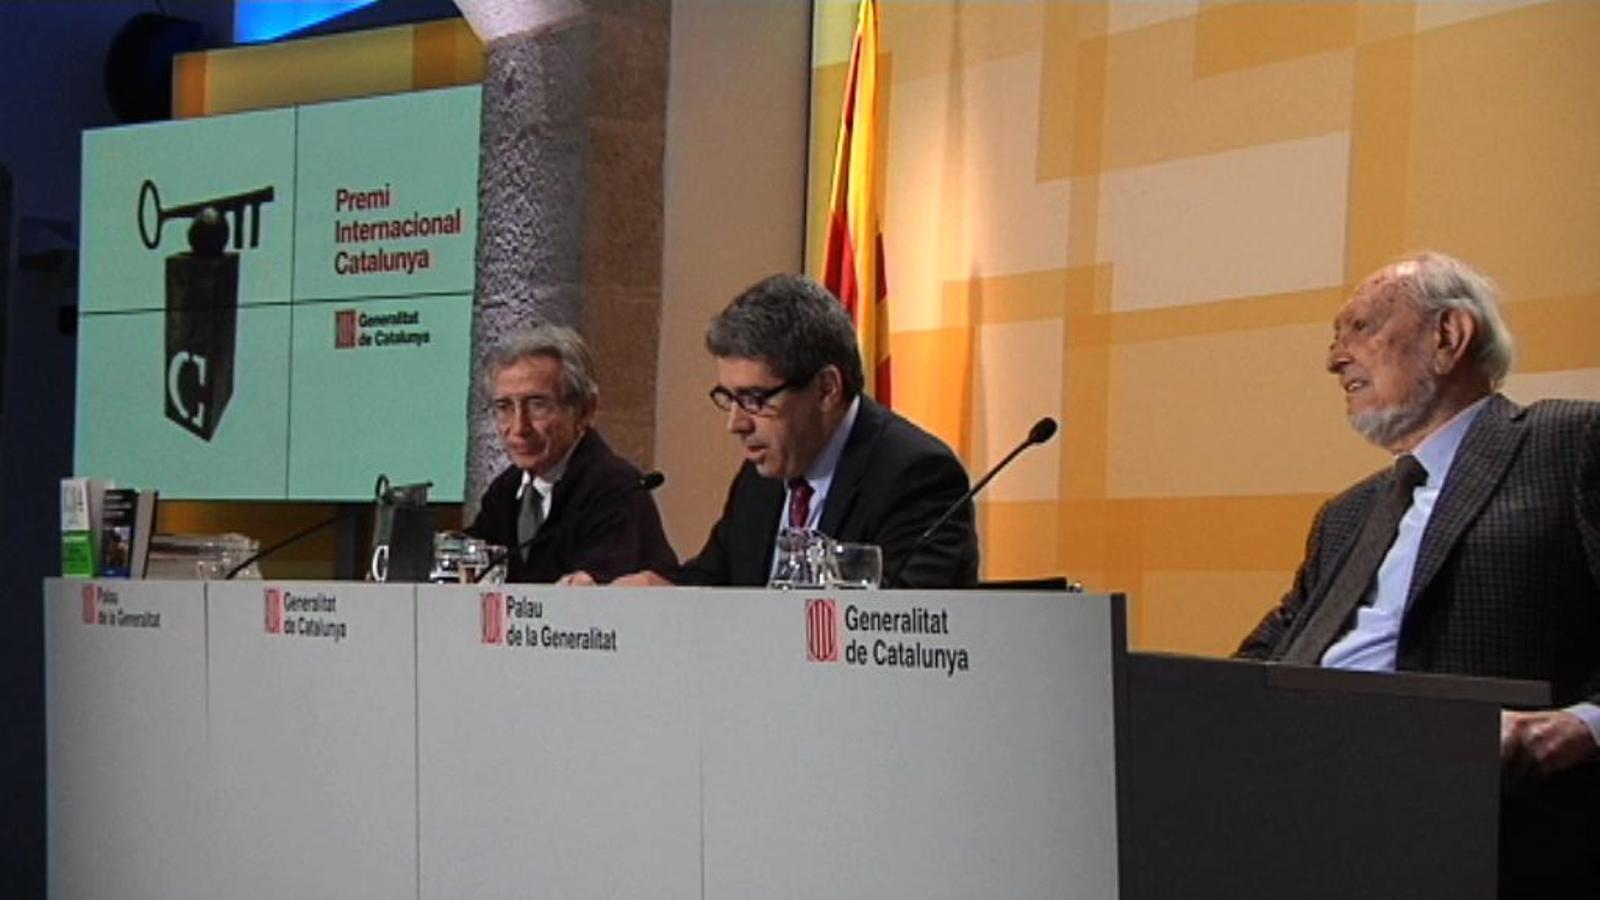 Haruki Murakami guanya el XXIII Premi Internacional de Catalunya